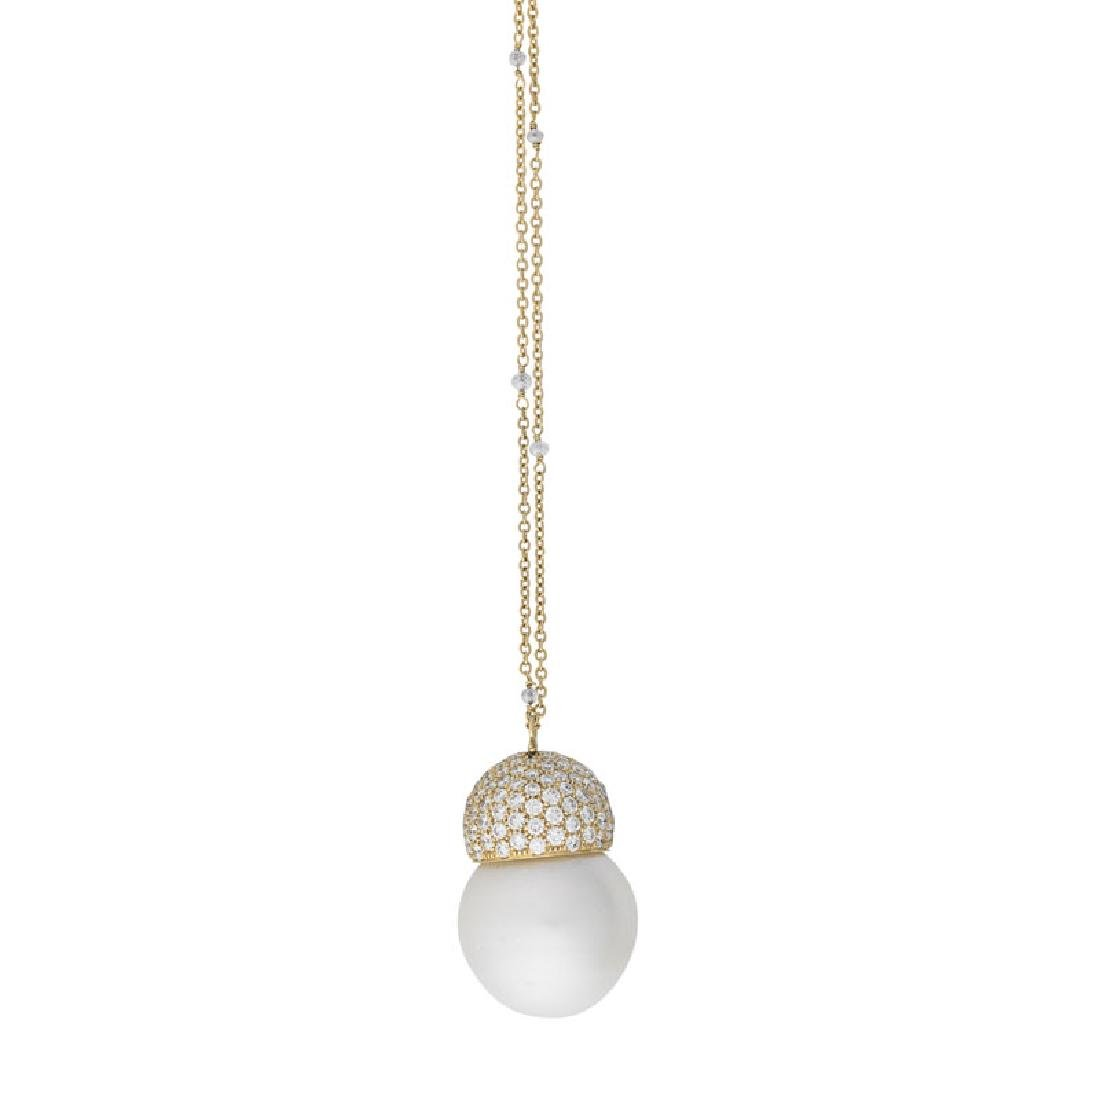 SIDNEY GARBER 'YUTA' SOUTH SEA PEARL, DIAMOND NECKLACE